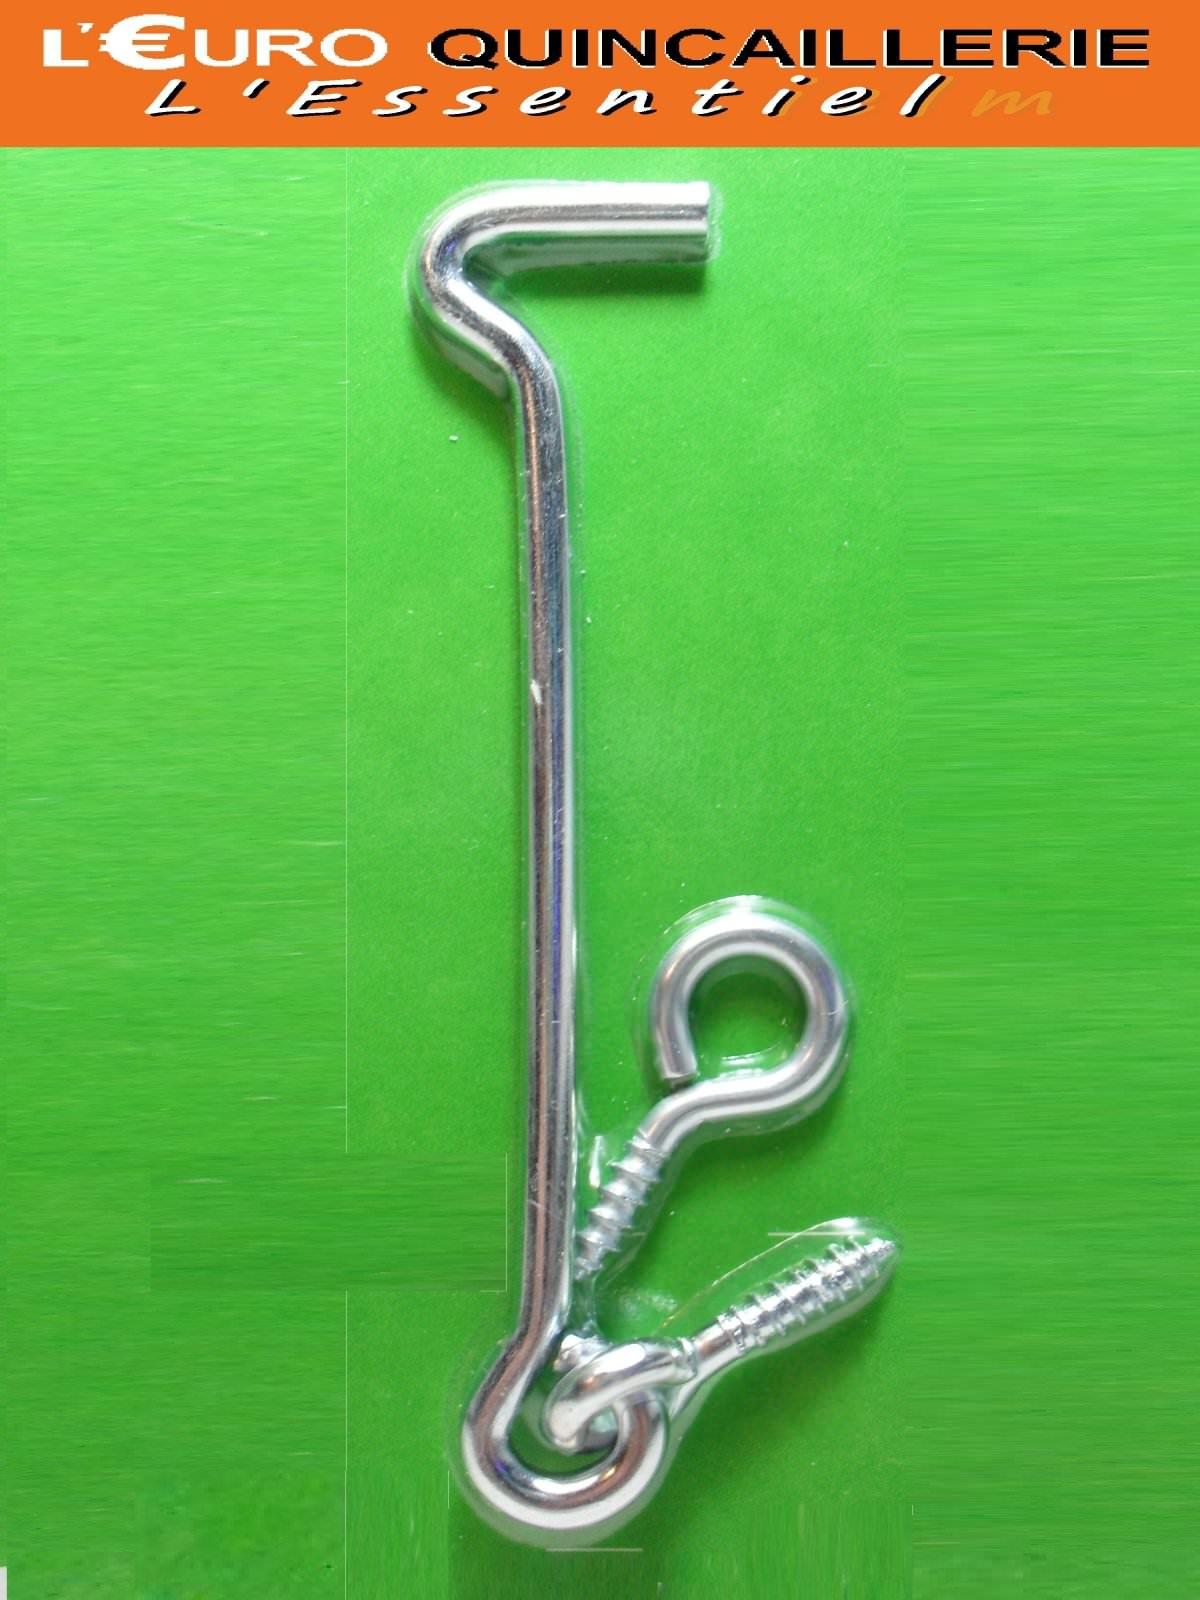 1 Crochet de contrevent 4x100mm